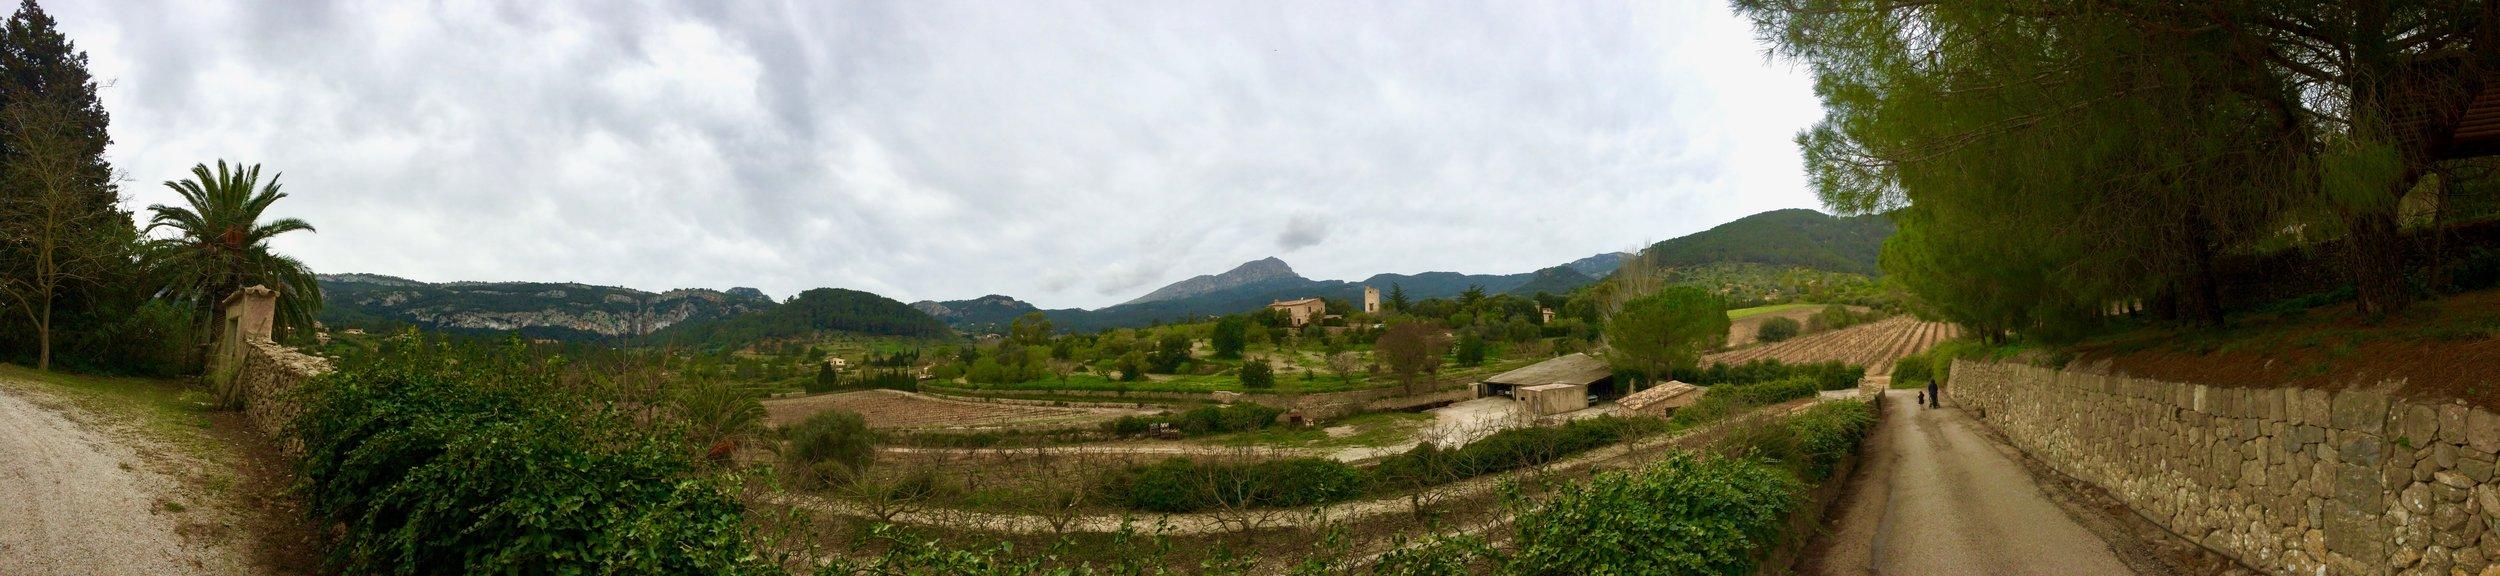 Terraced vineyards of Majorca